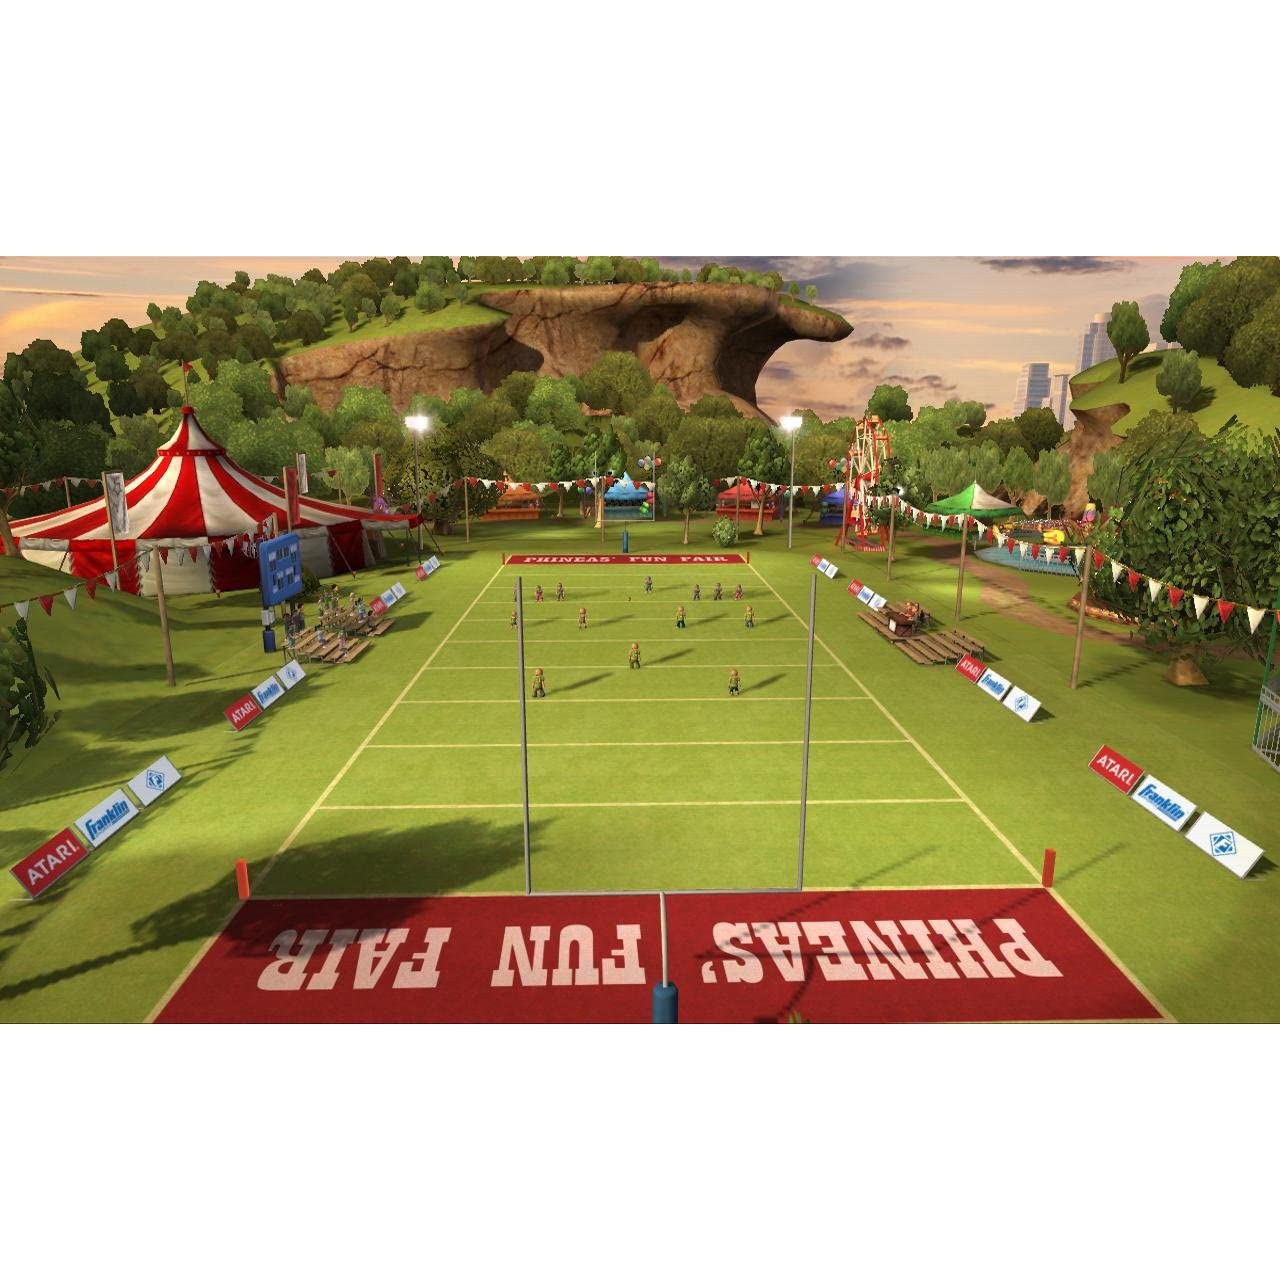 2013 10 27 15 19 後院運動.菜鳥向前衝 Backyard Sports Football